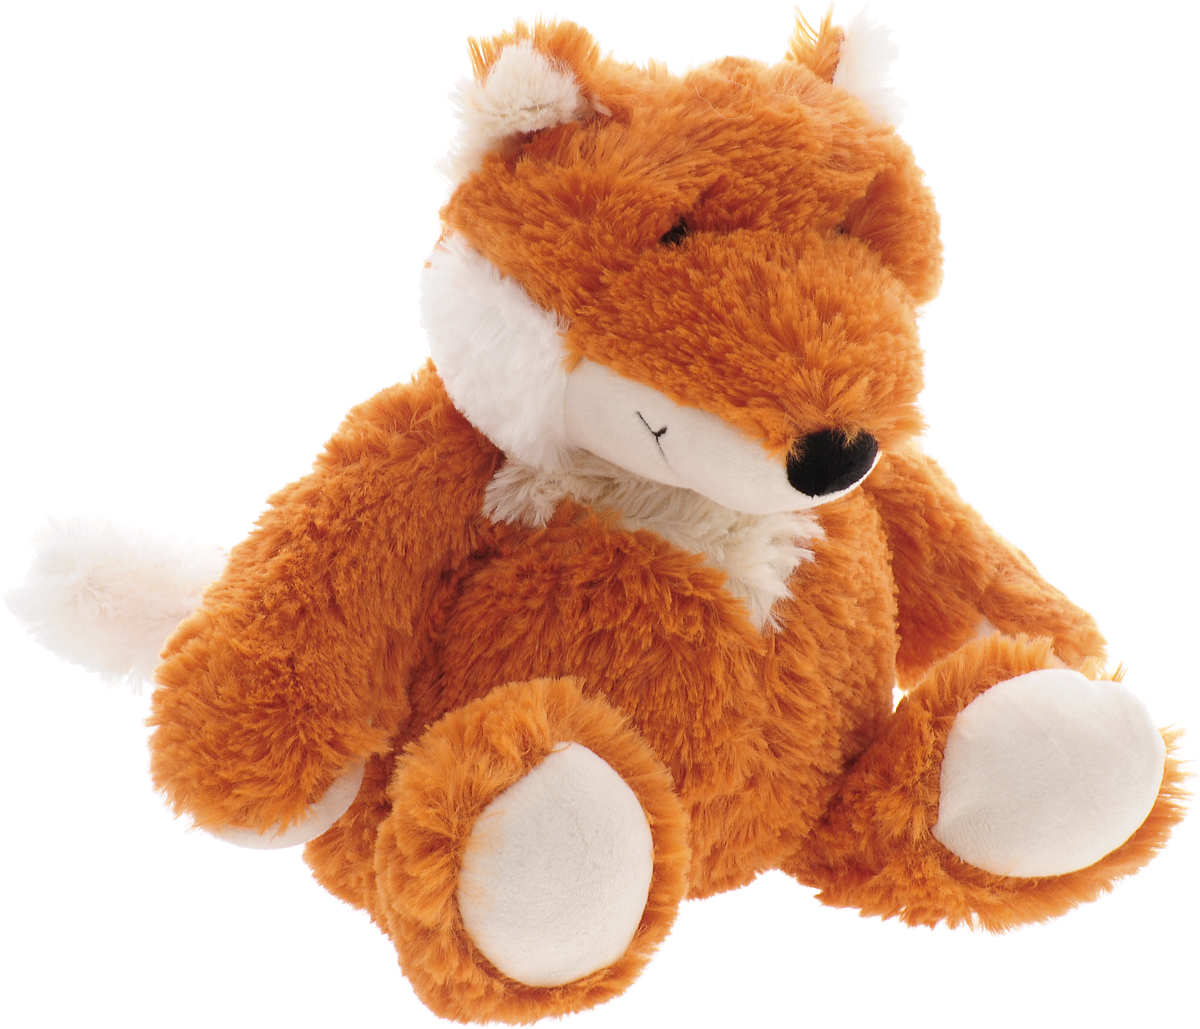 Warmies Мягкая игрушка-грелка Лиса грелки warmies cozy plush игрушка грелка дракон